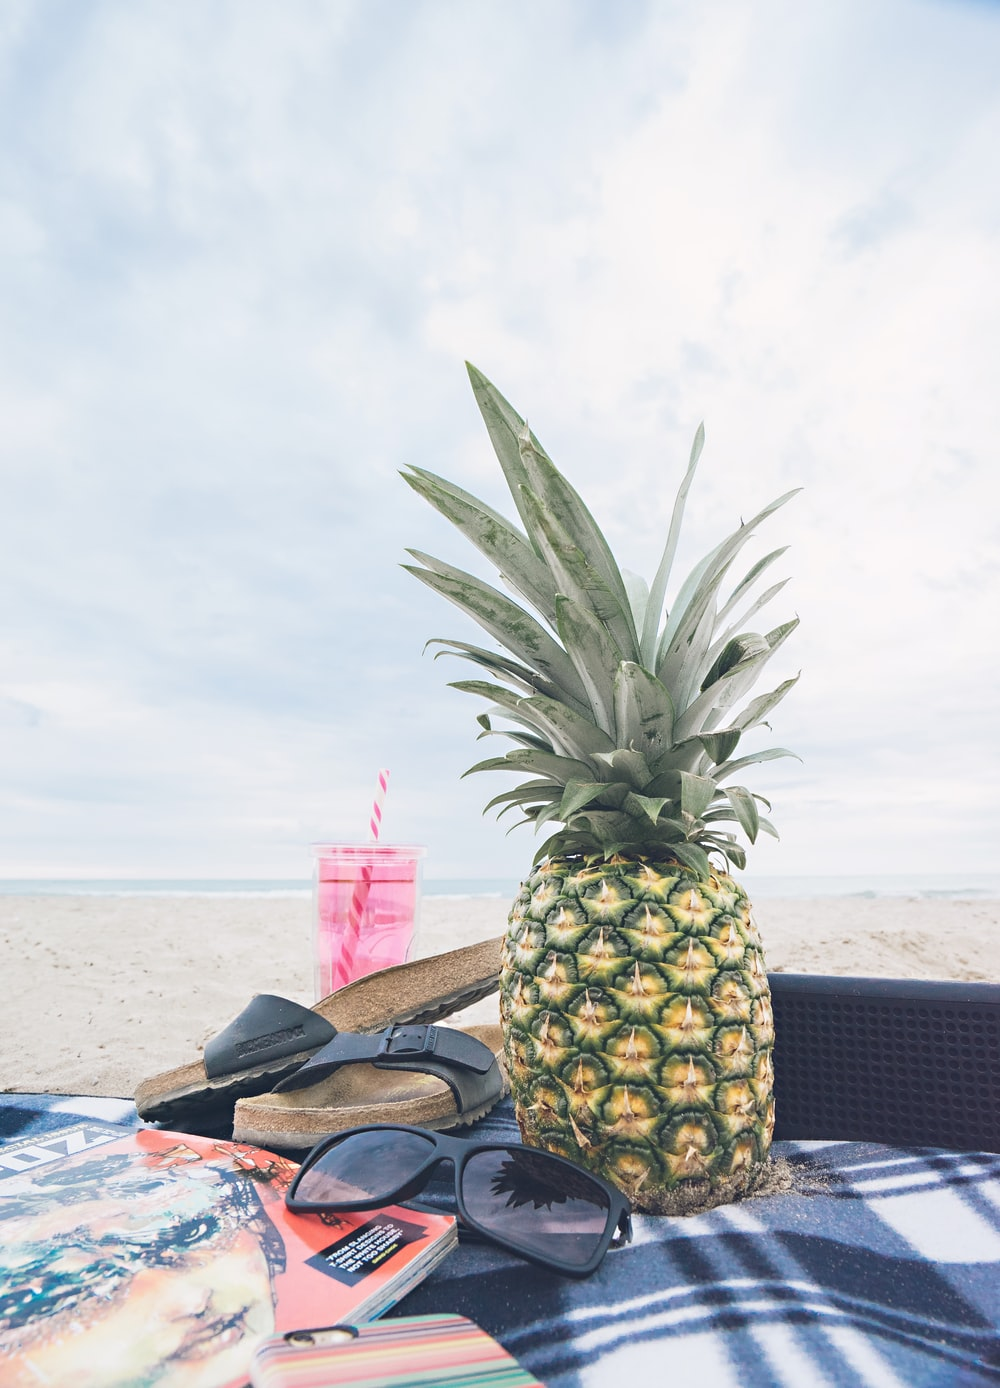 pineapple beside black sunglasses